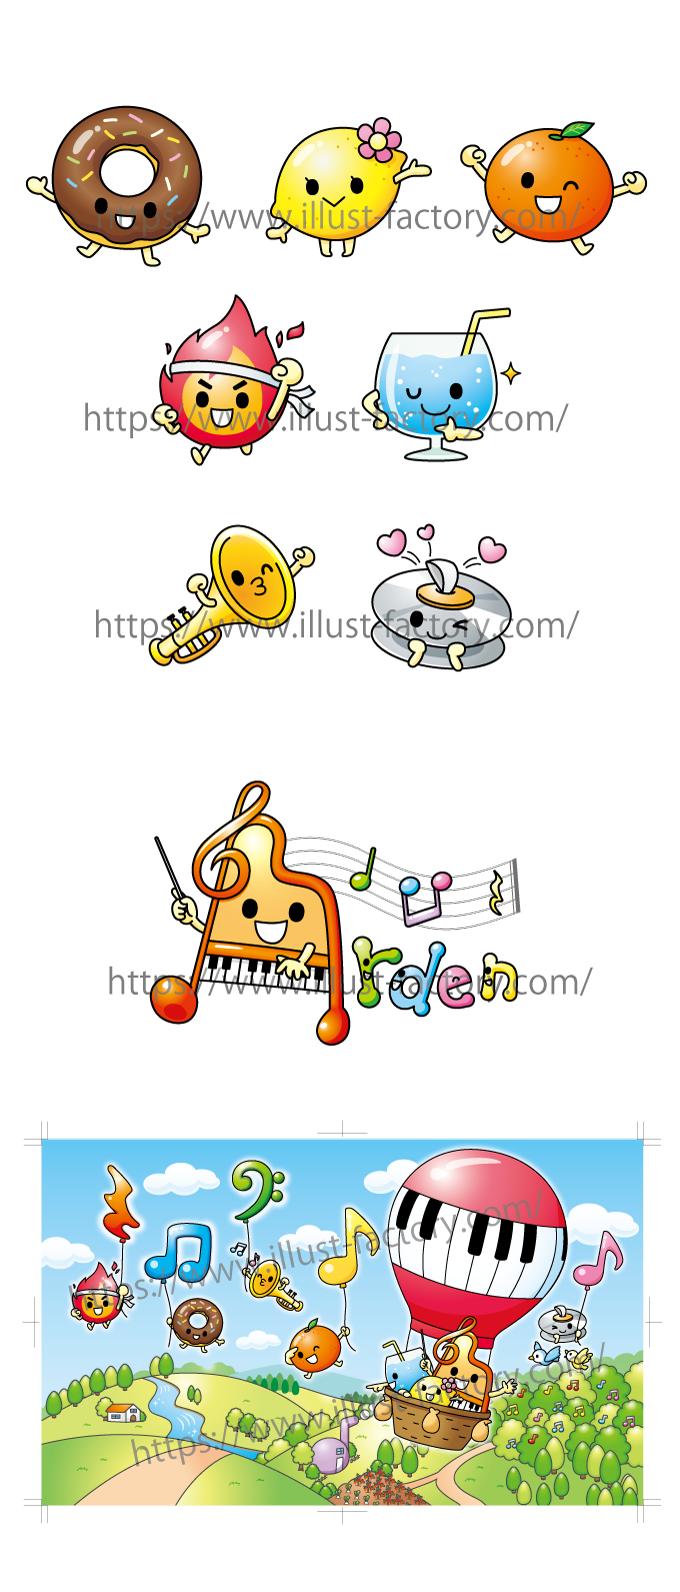 C95 音楽教室ゆるキャラ制作 音符モチーフキャラクター